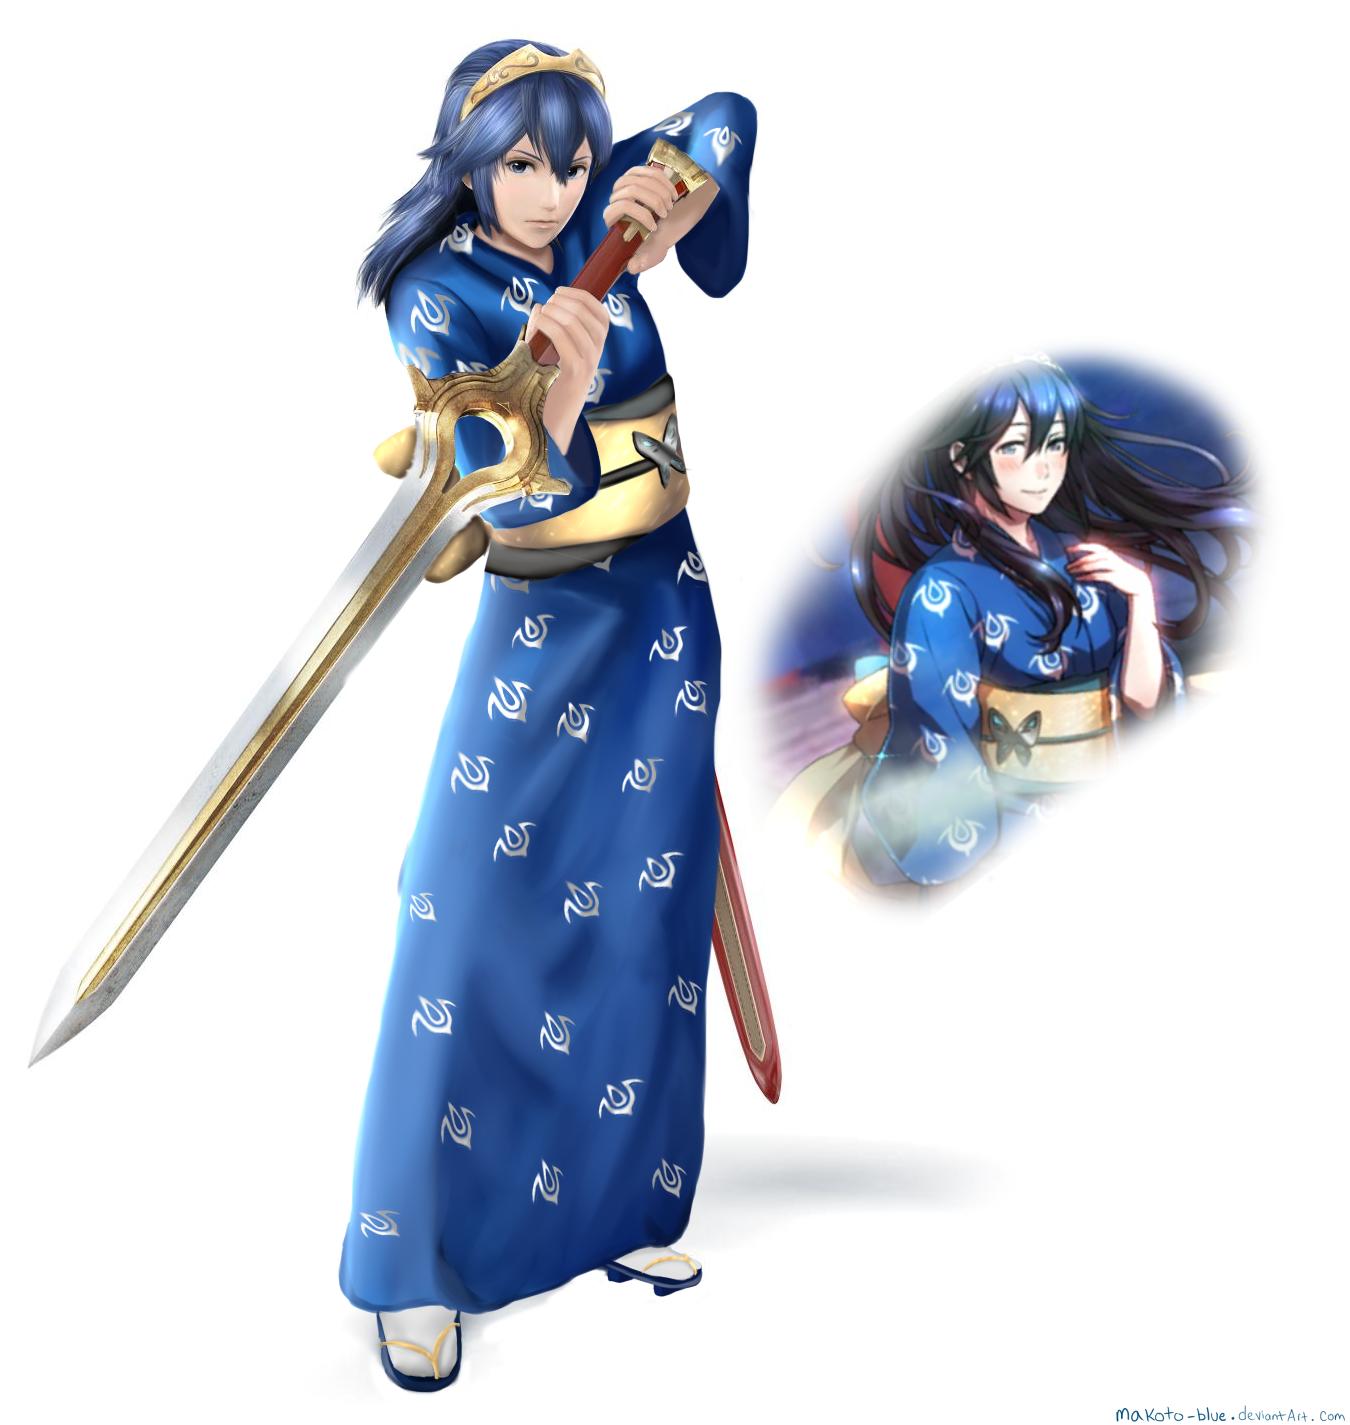 Yukata Lucina by Makoto-Blue on DeviantArt